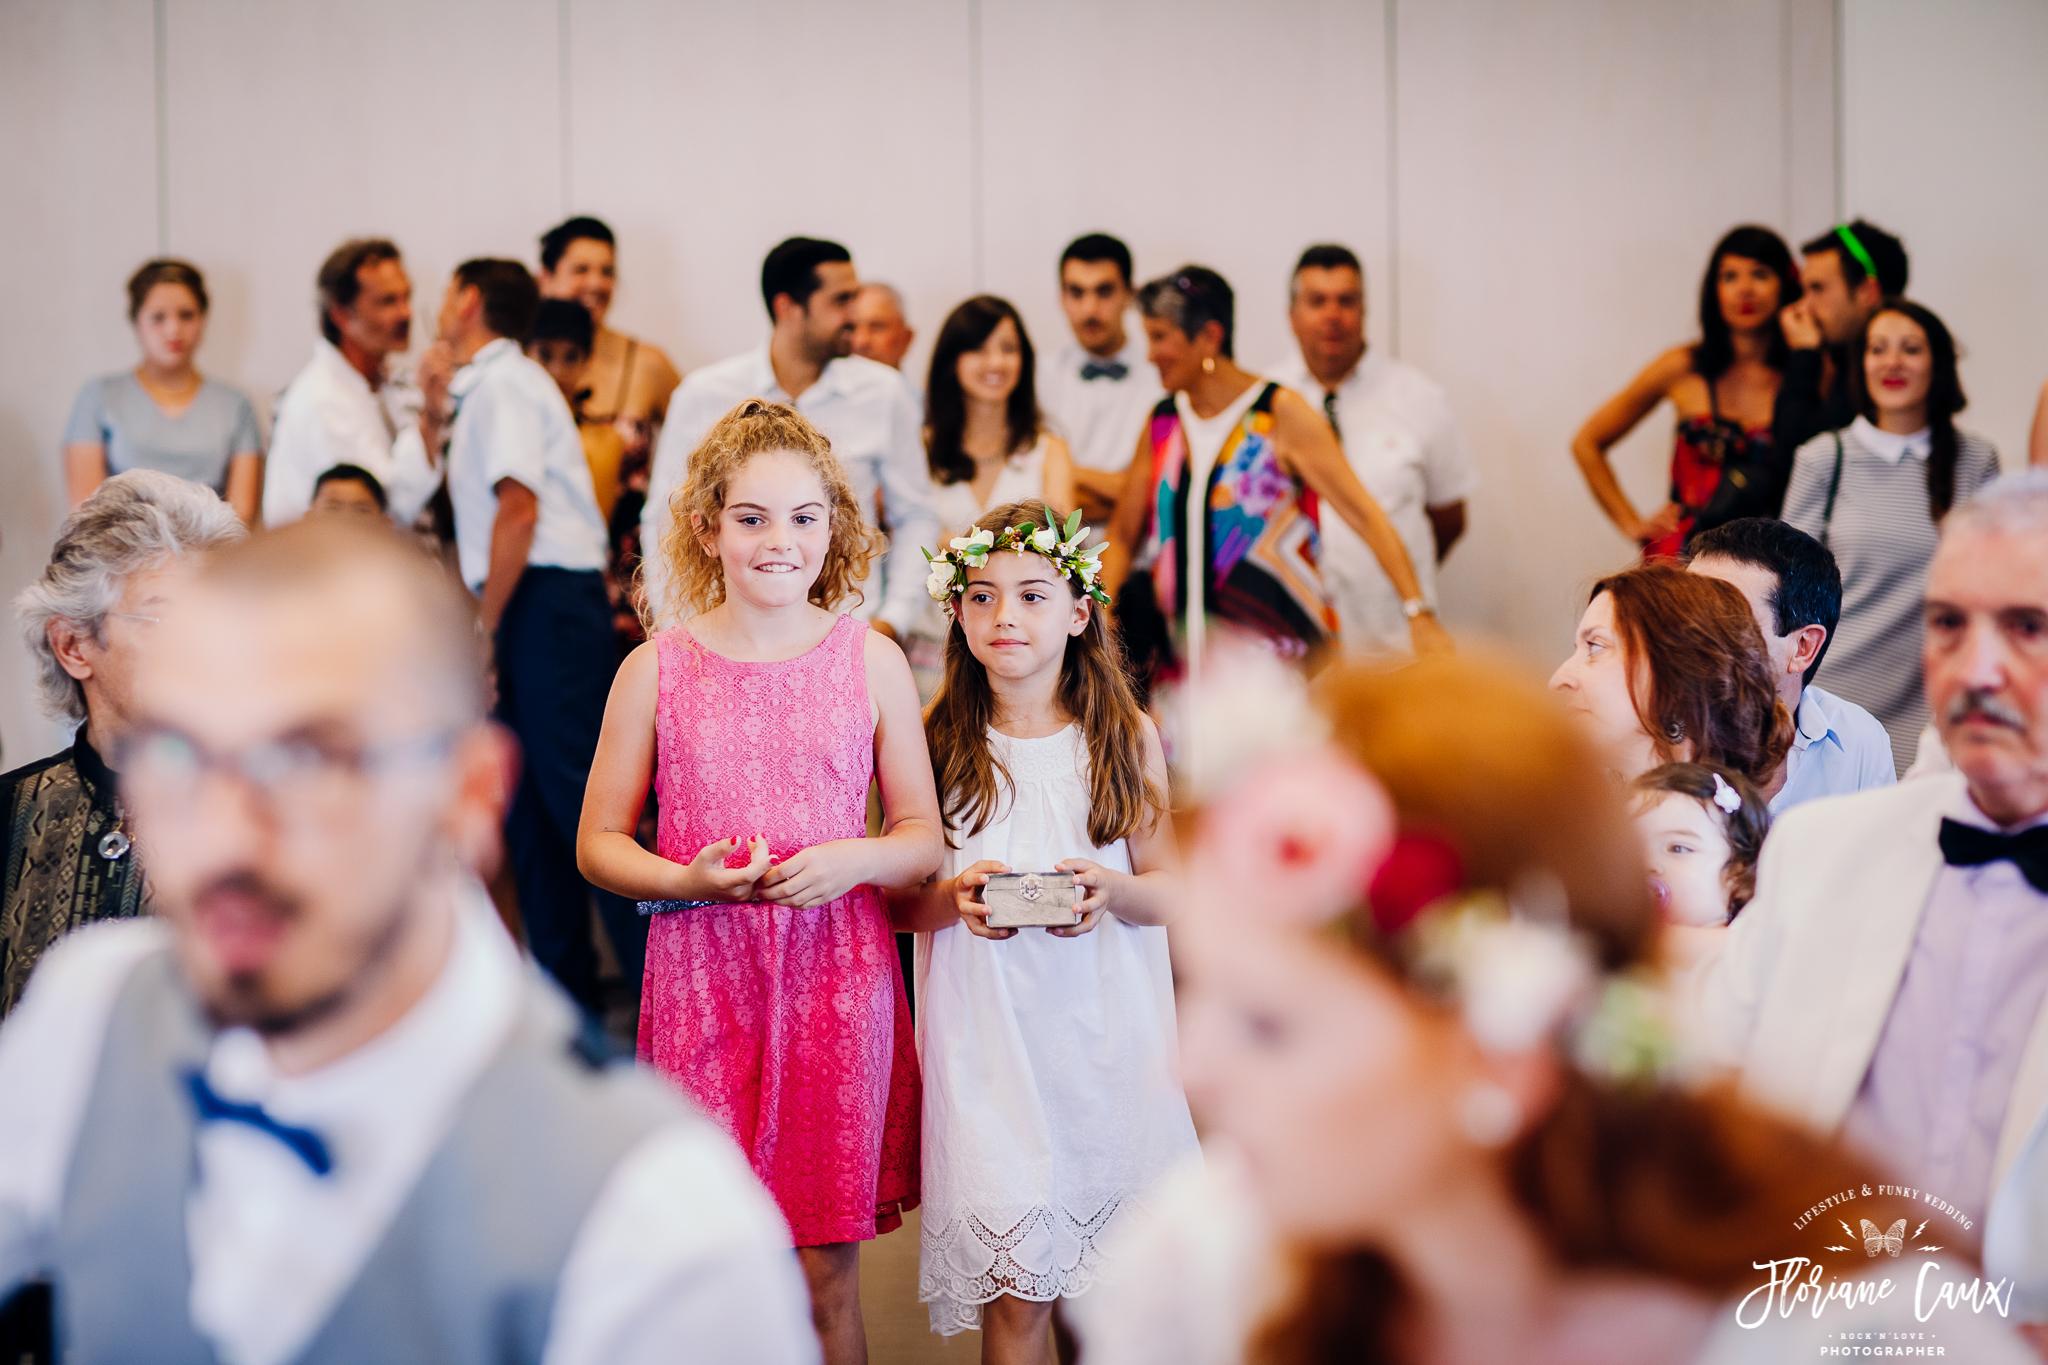 photographe-mariage-toulouse-rocknroll-maries-tatoues-floriane-caux-34